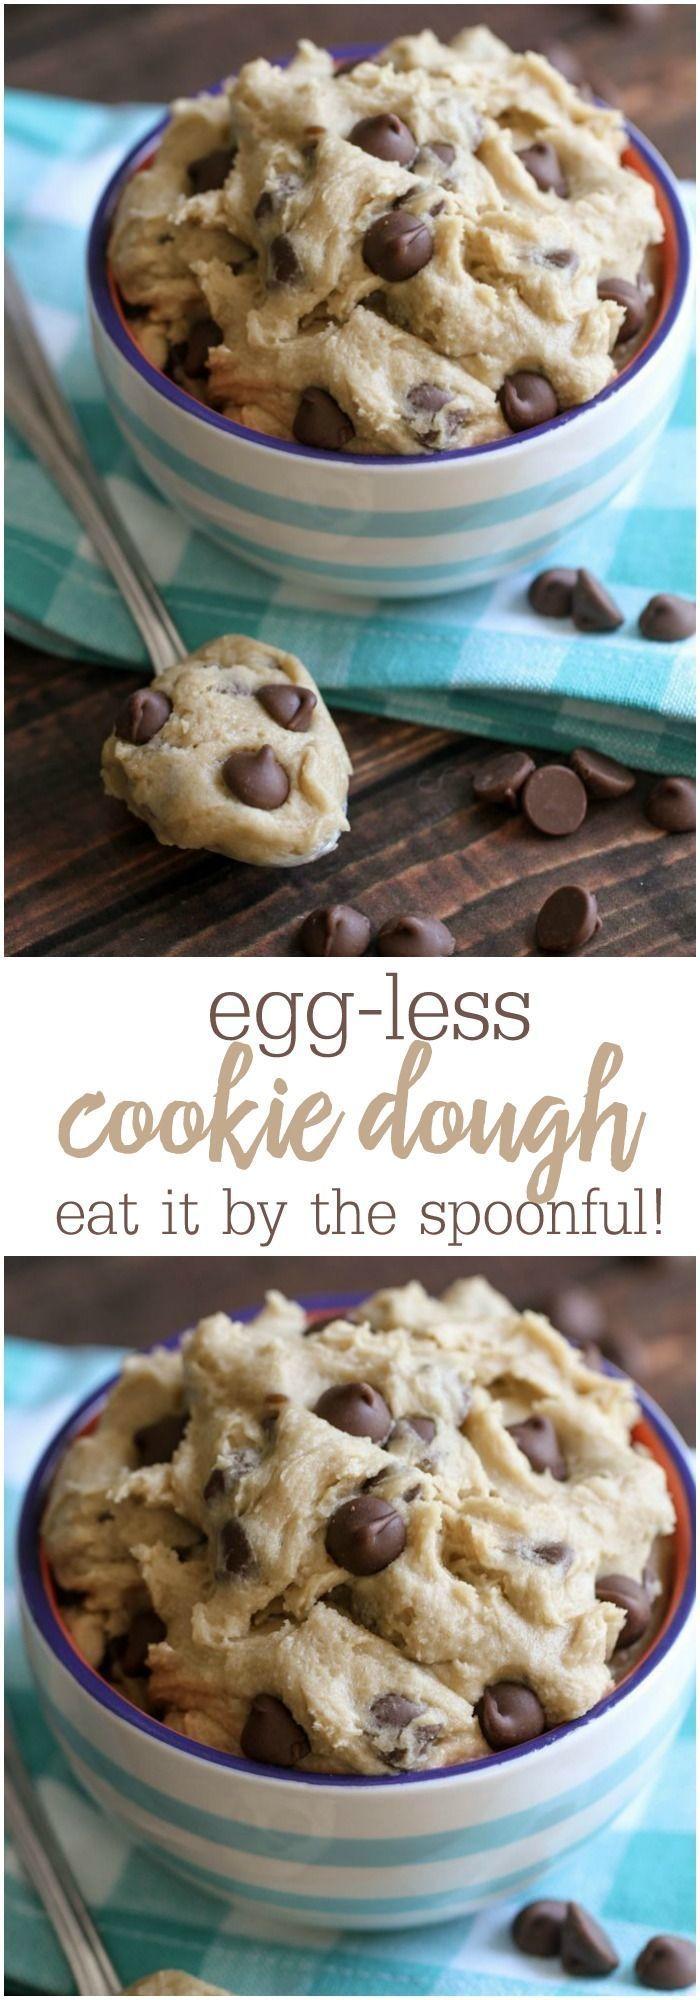 Grab a Spoon!! Egg-less Cookie Dough recipe for all the cookie dough lovers! { http://lilluna.com }